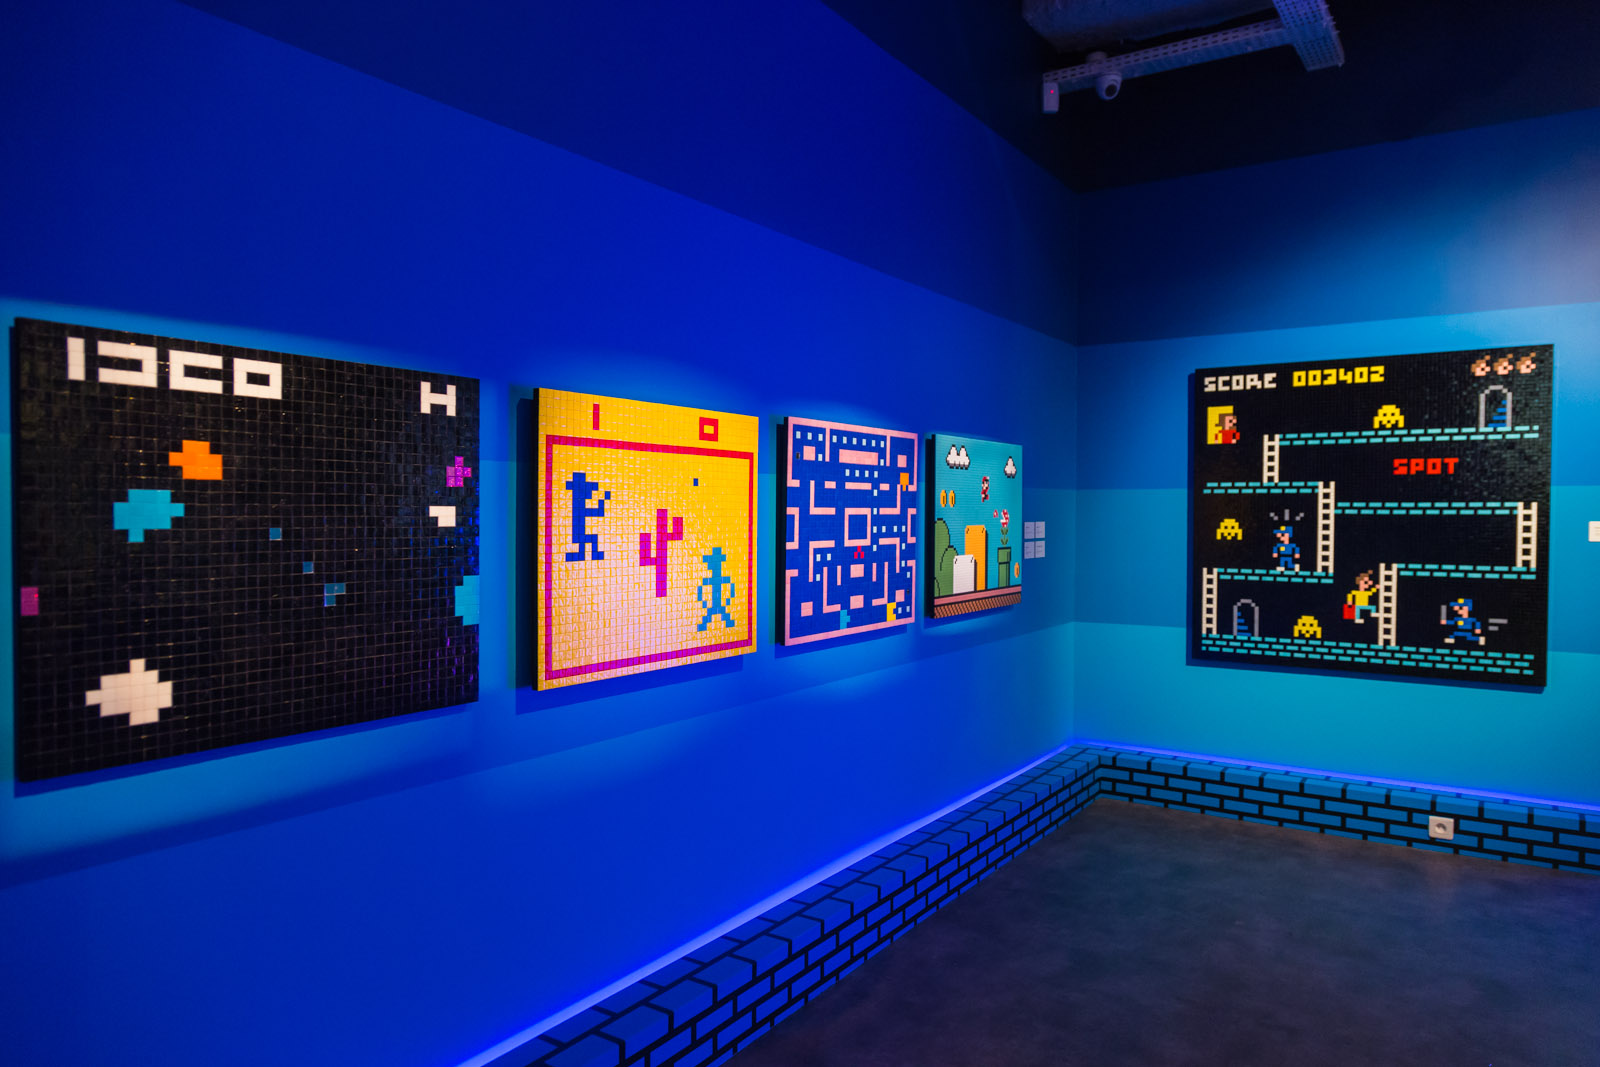 "Musée en Herbe - Exposition Invader ""Hello, my game is..."" du 26/01/2017 au 03/09/2017 - Paris"